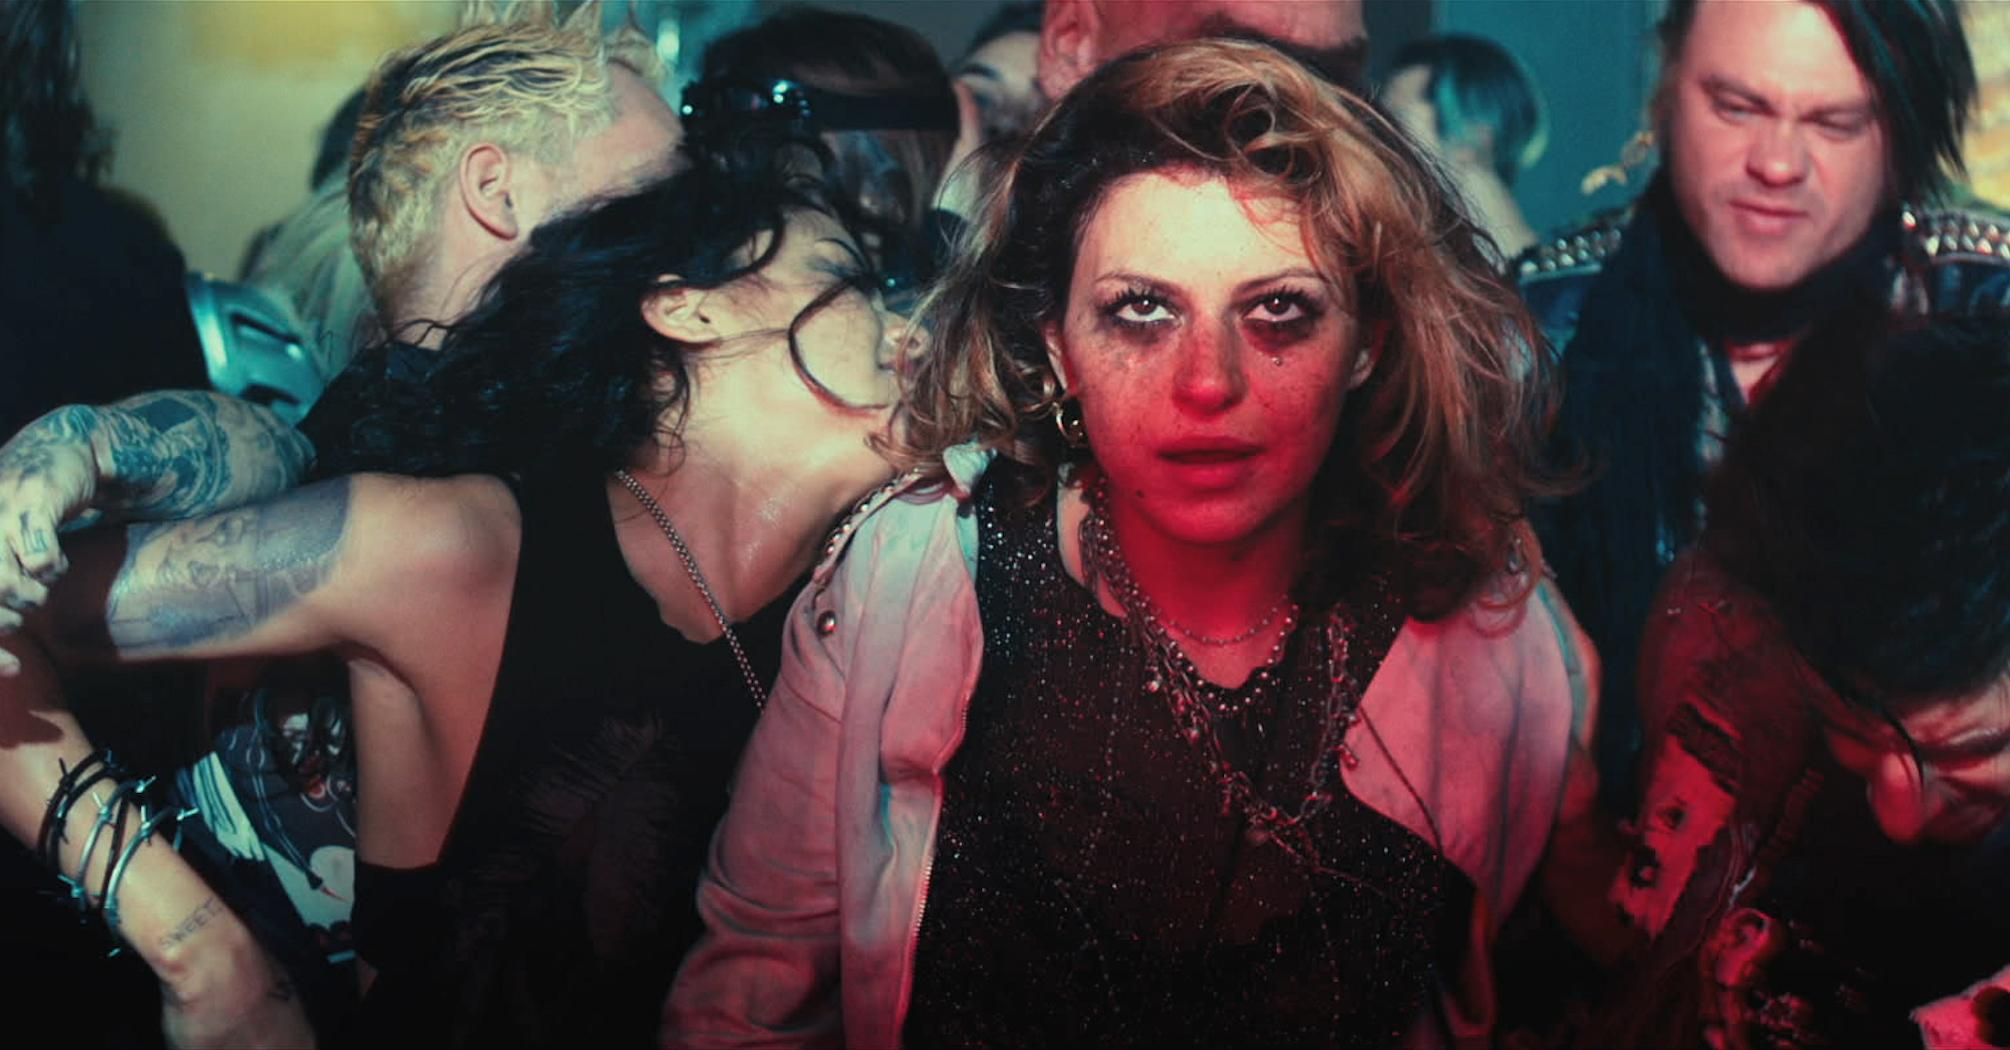 Alia Shawkat in Paint it Black, directed by Amber Tamblyn